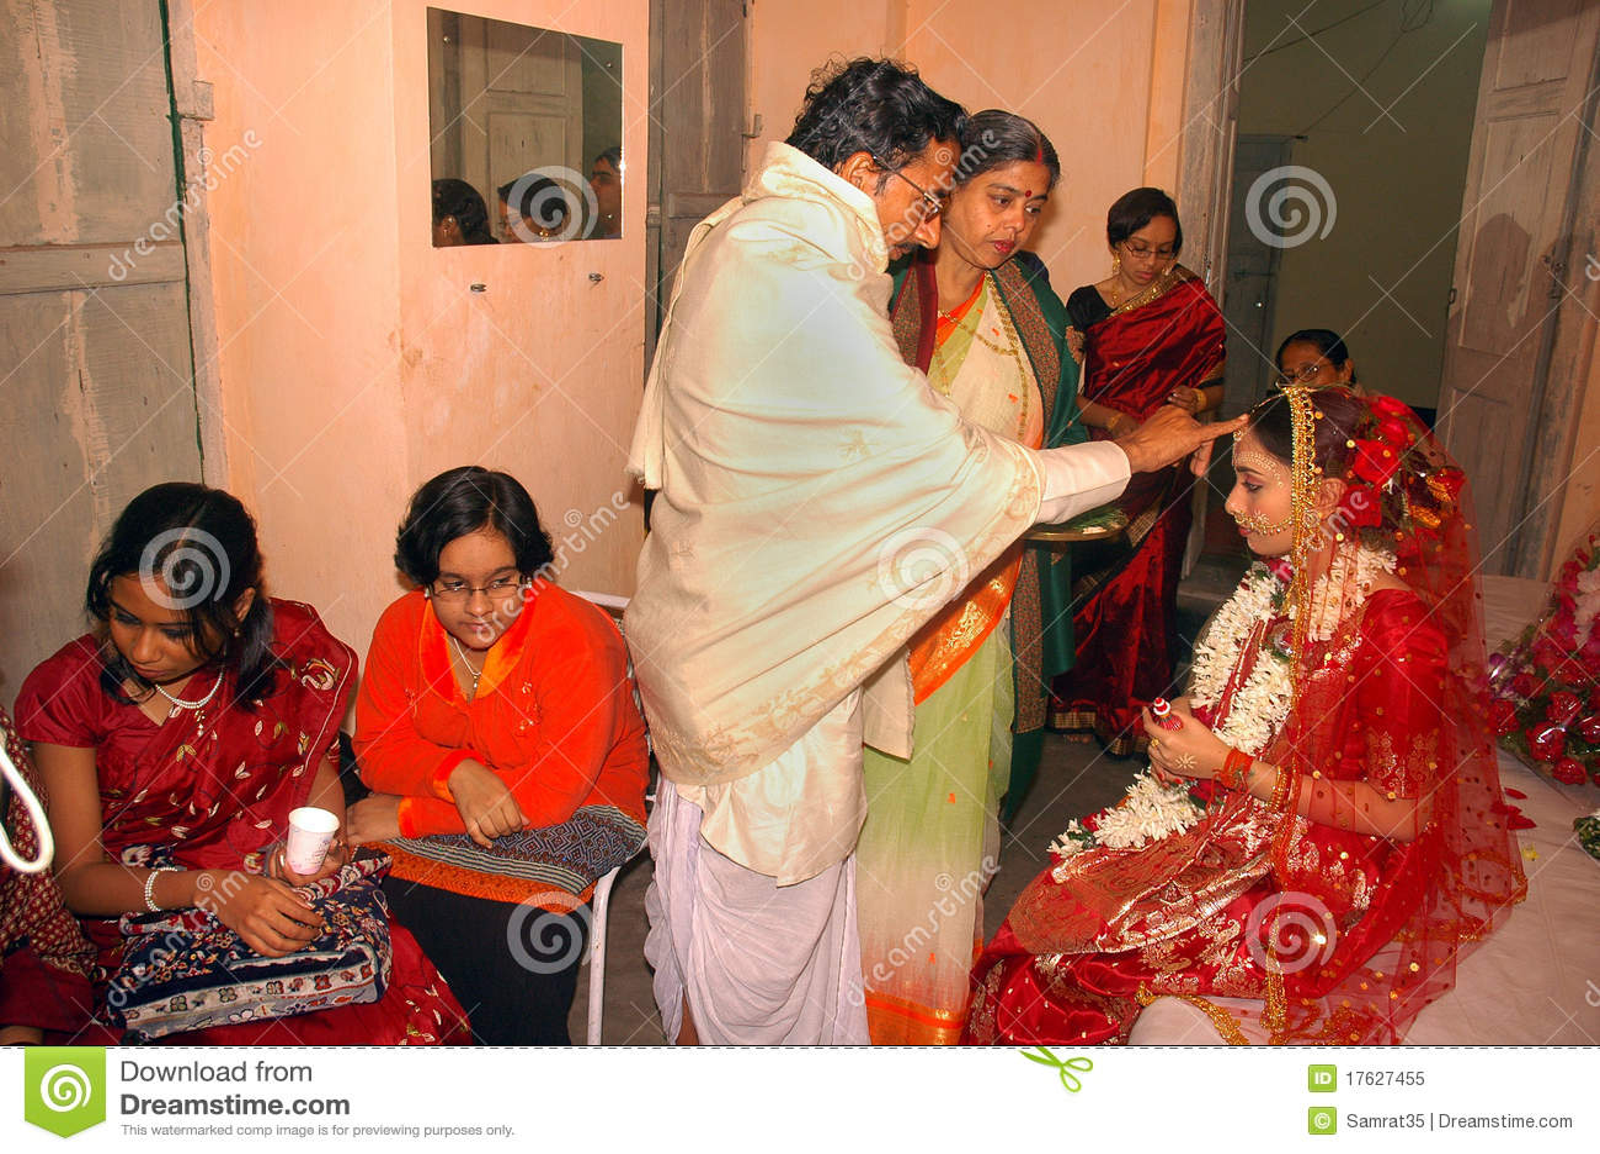 bengali wedding rituals in india editorial image